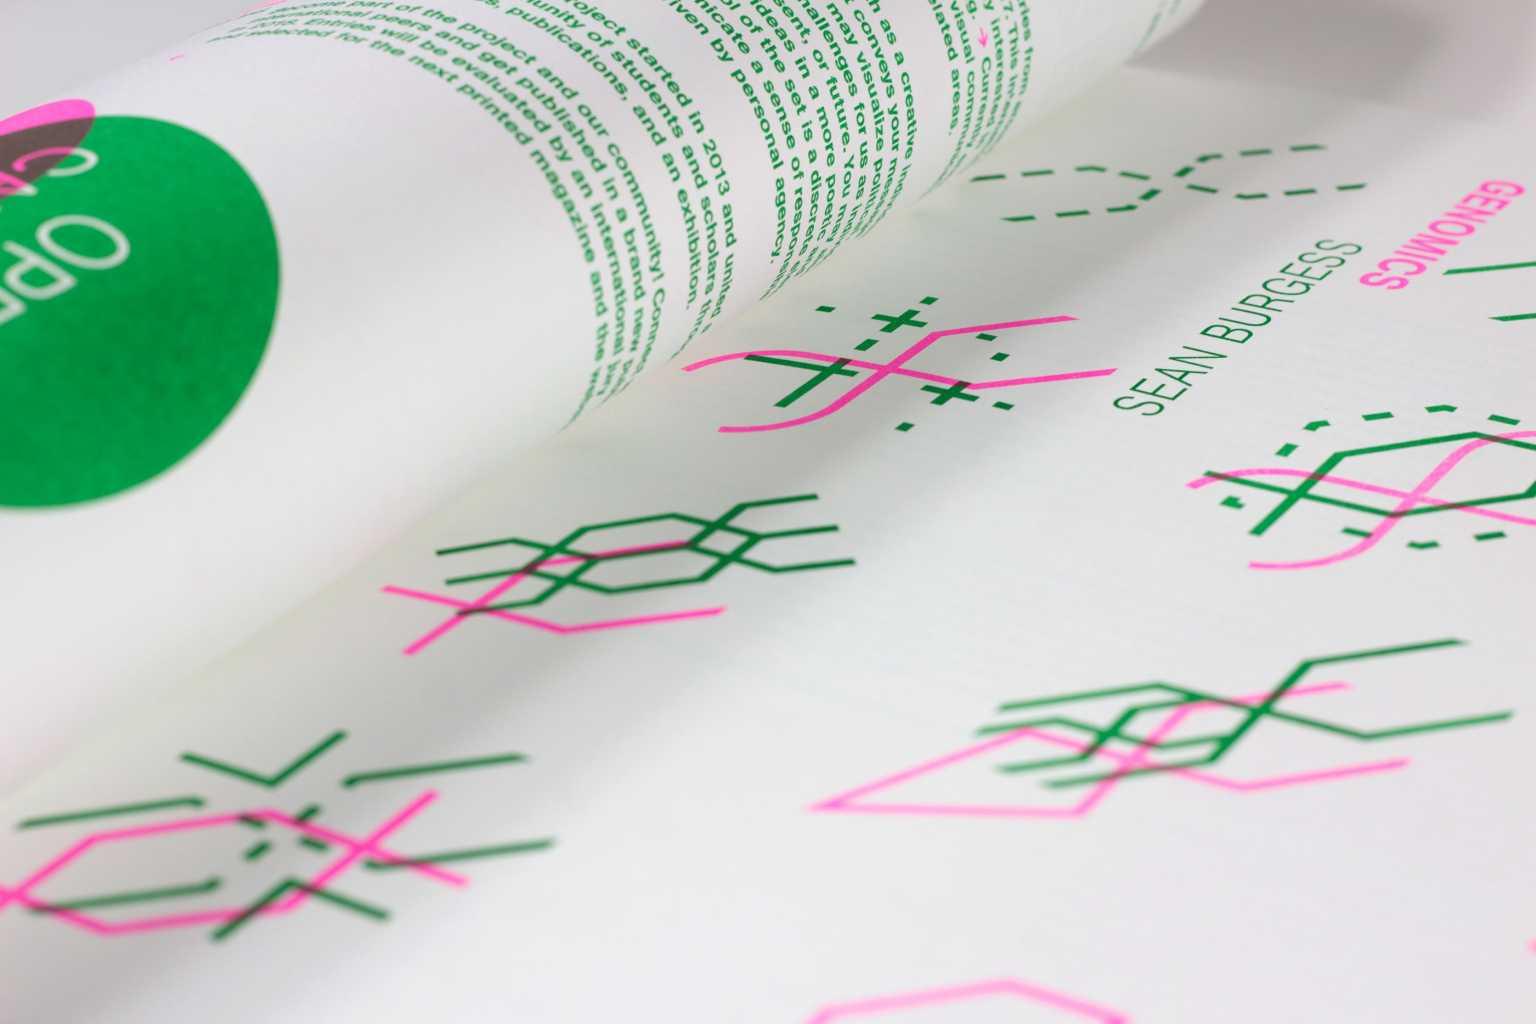 Detail of 45 symbols representing genomics